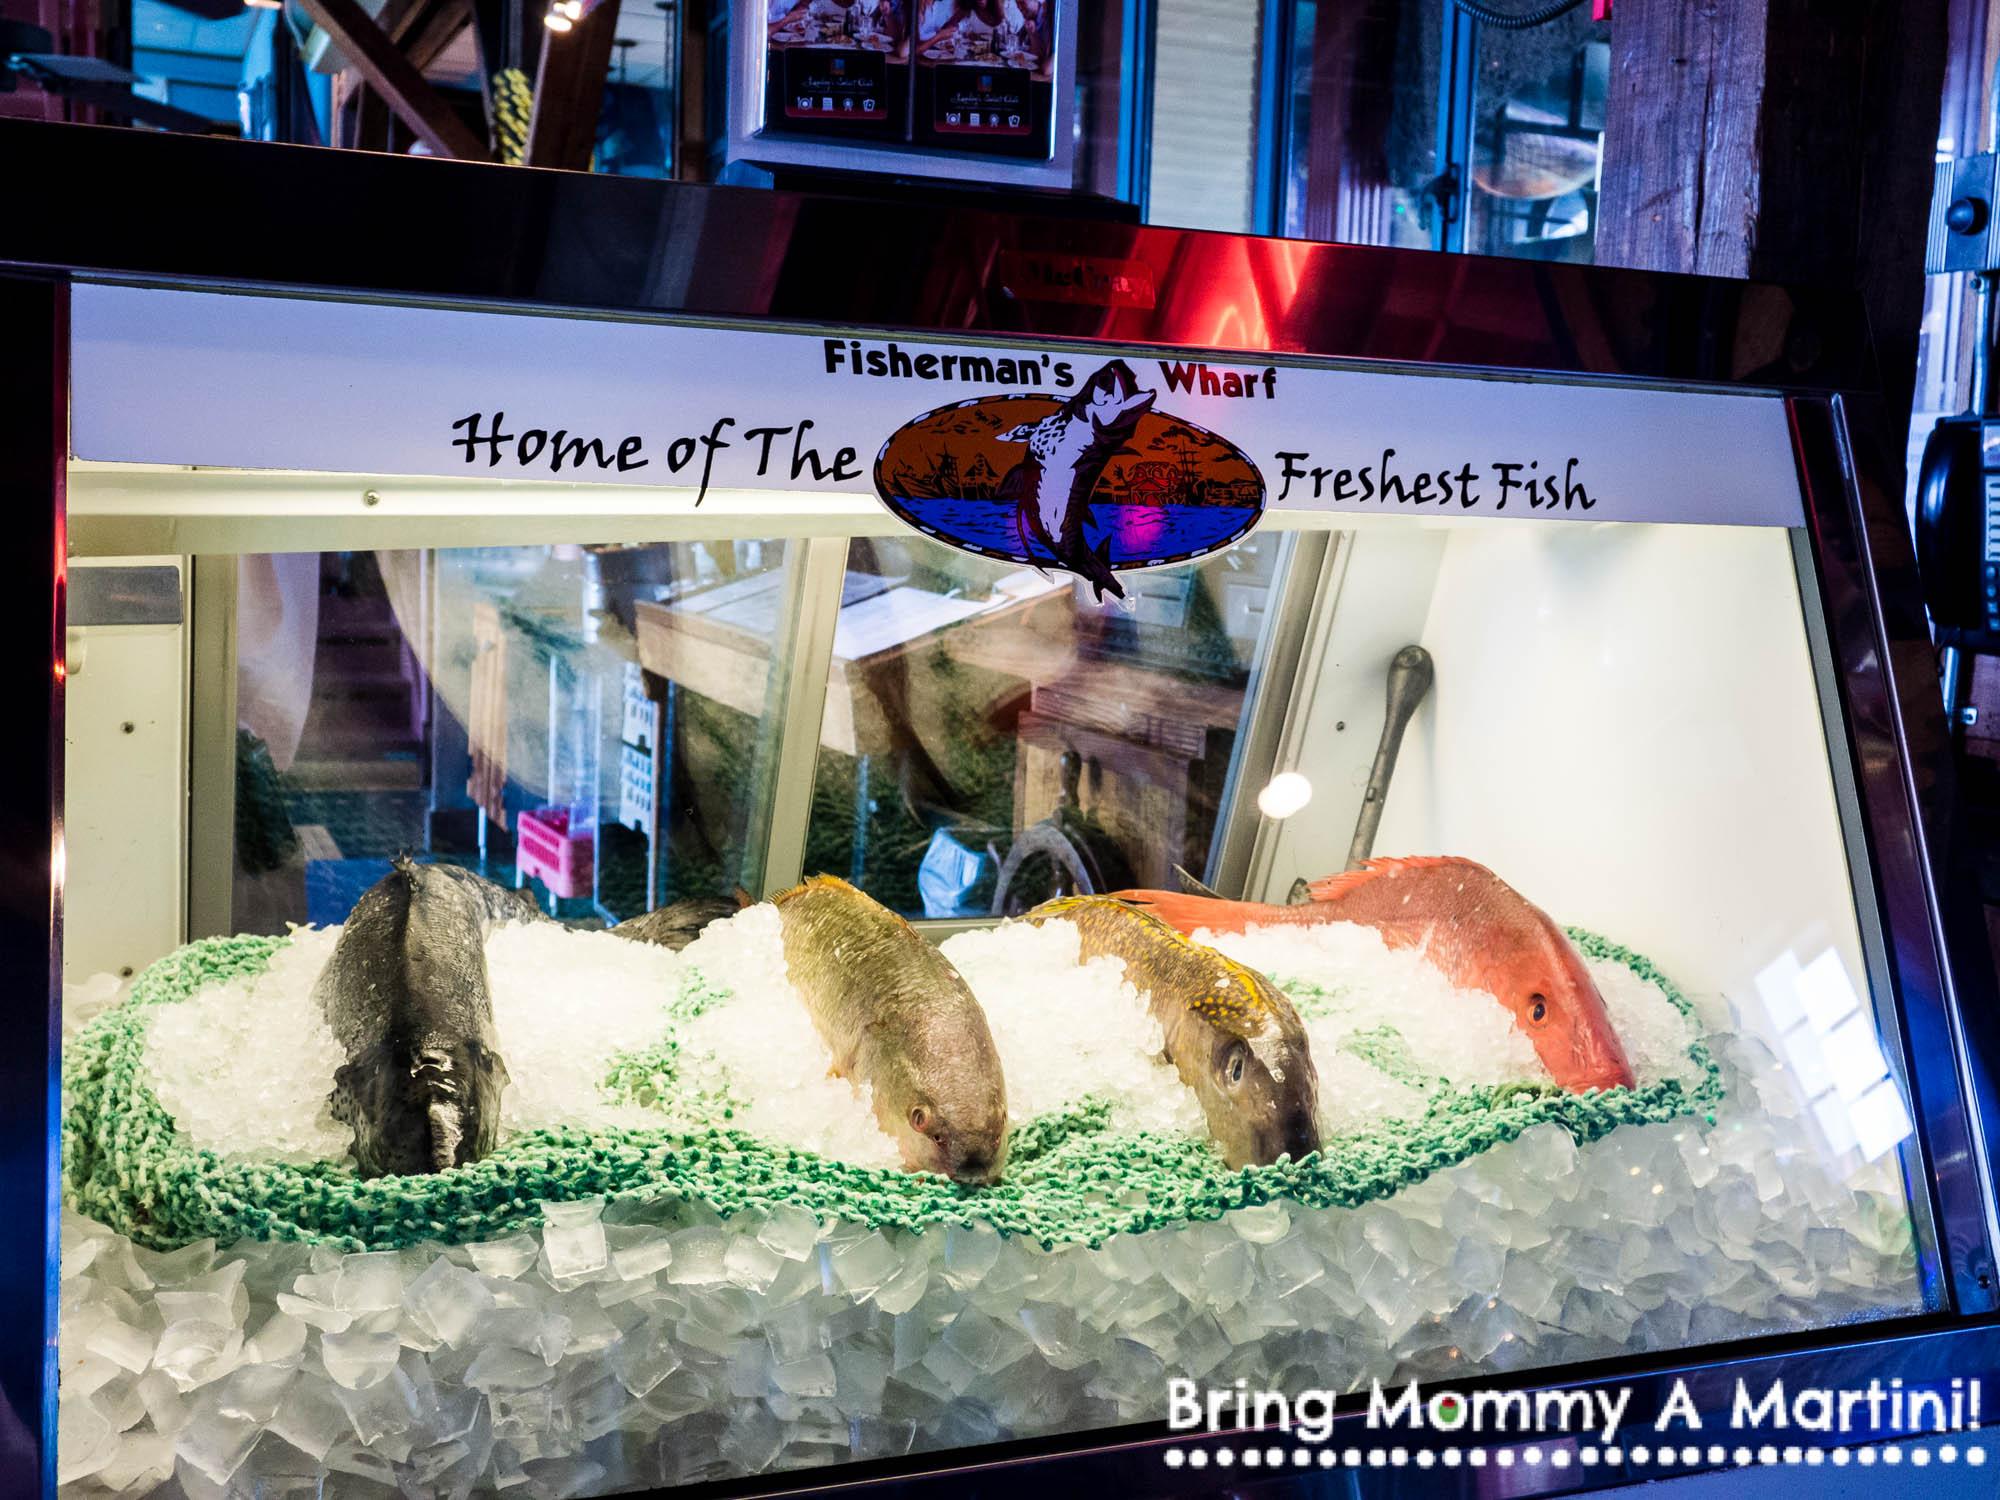 Fresh fish at Fisherman's Wharf